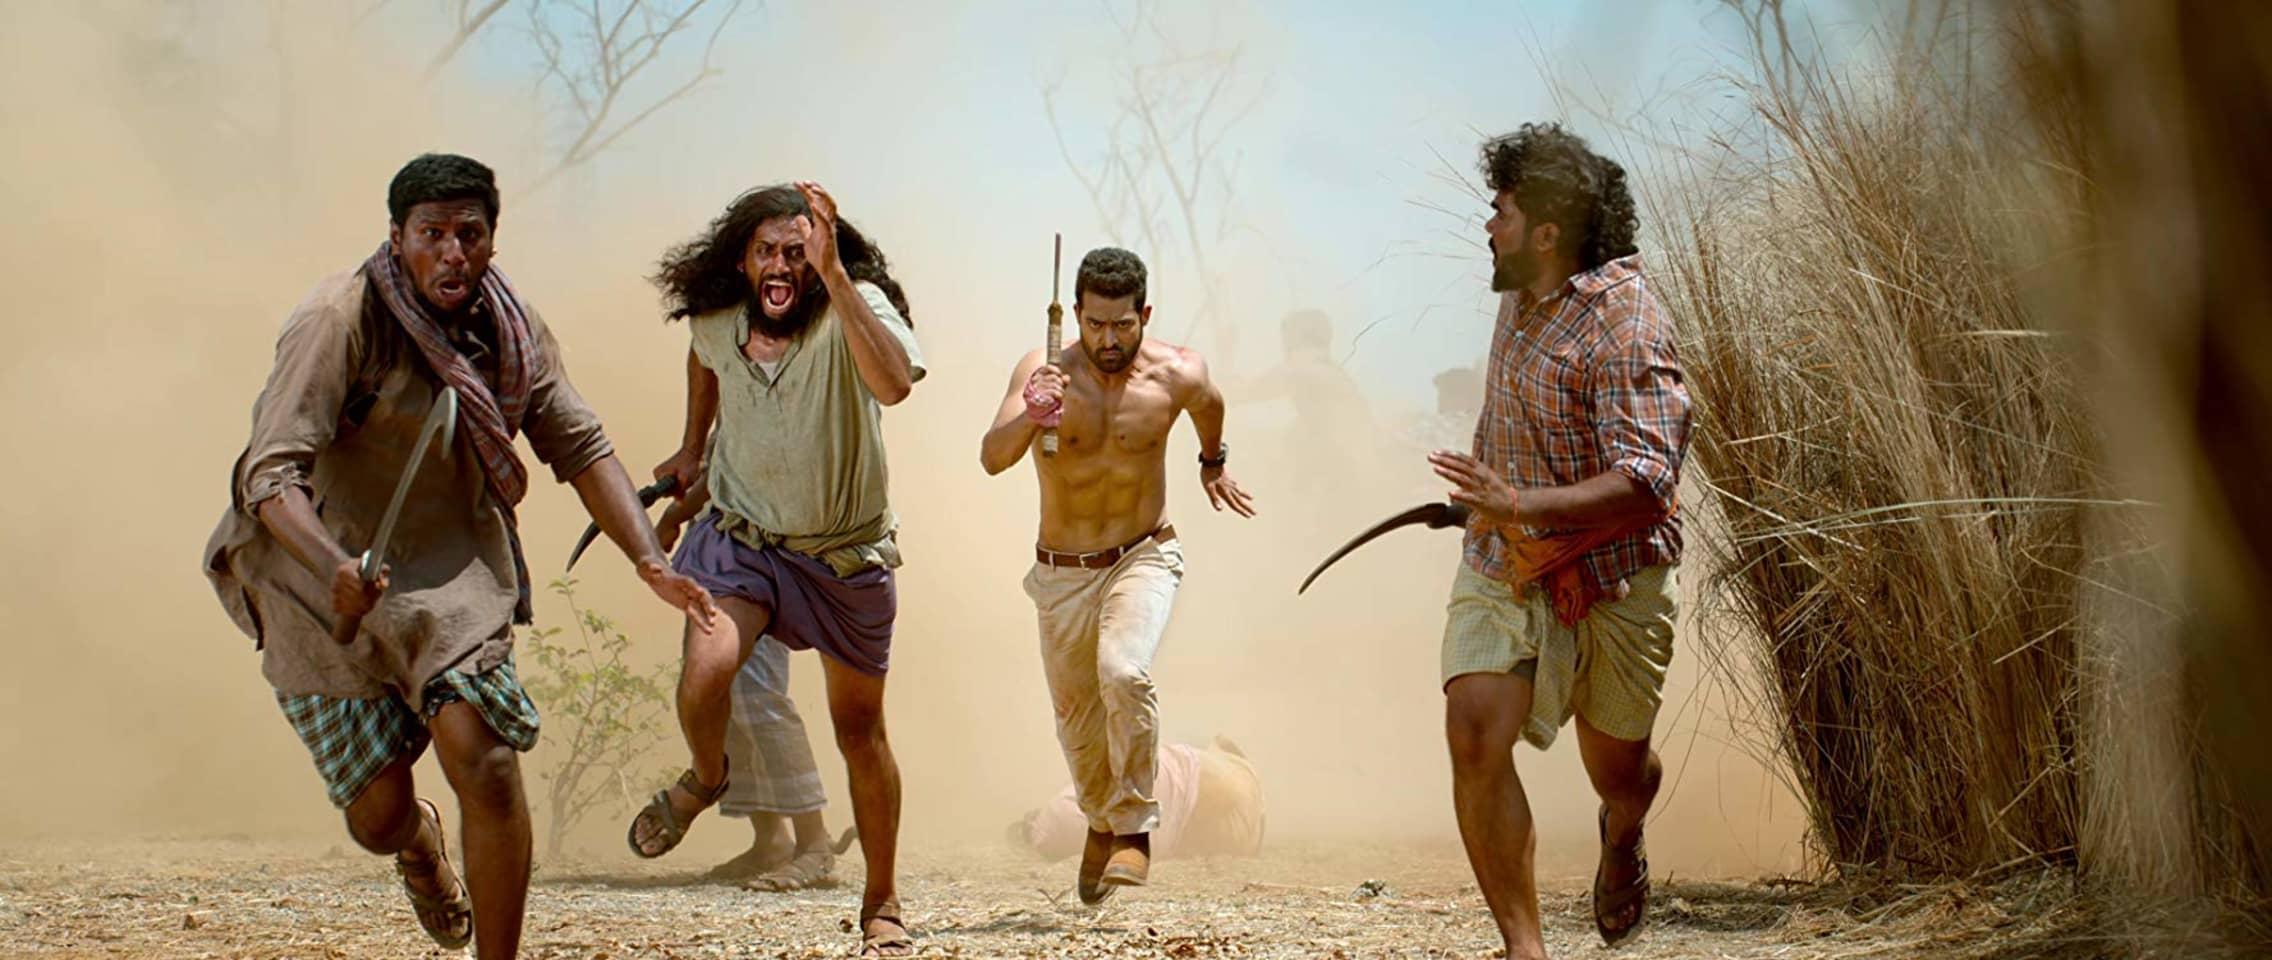 Aravindha Sametha (Aravinda Sametha Veera Raghava) | Showtimes, Tickets &  Reviews - Atom Tickets